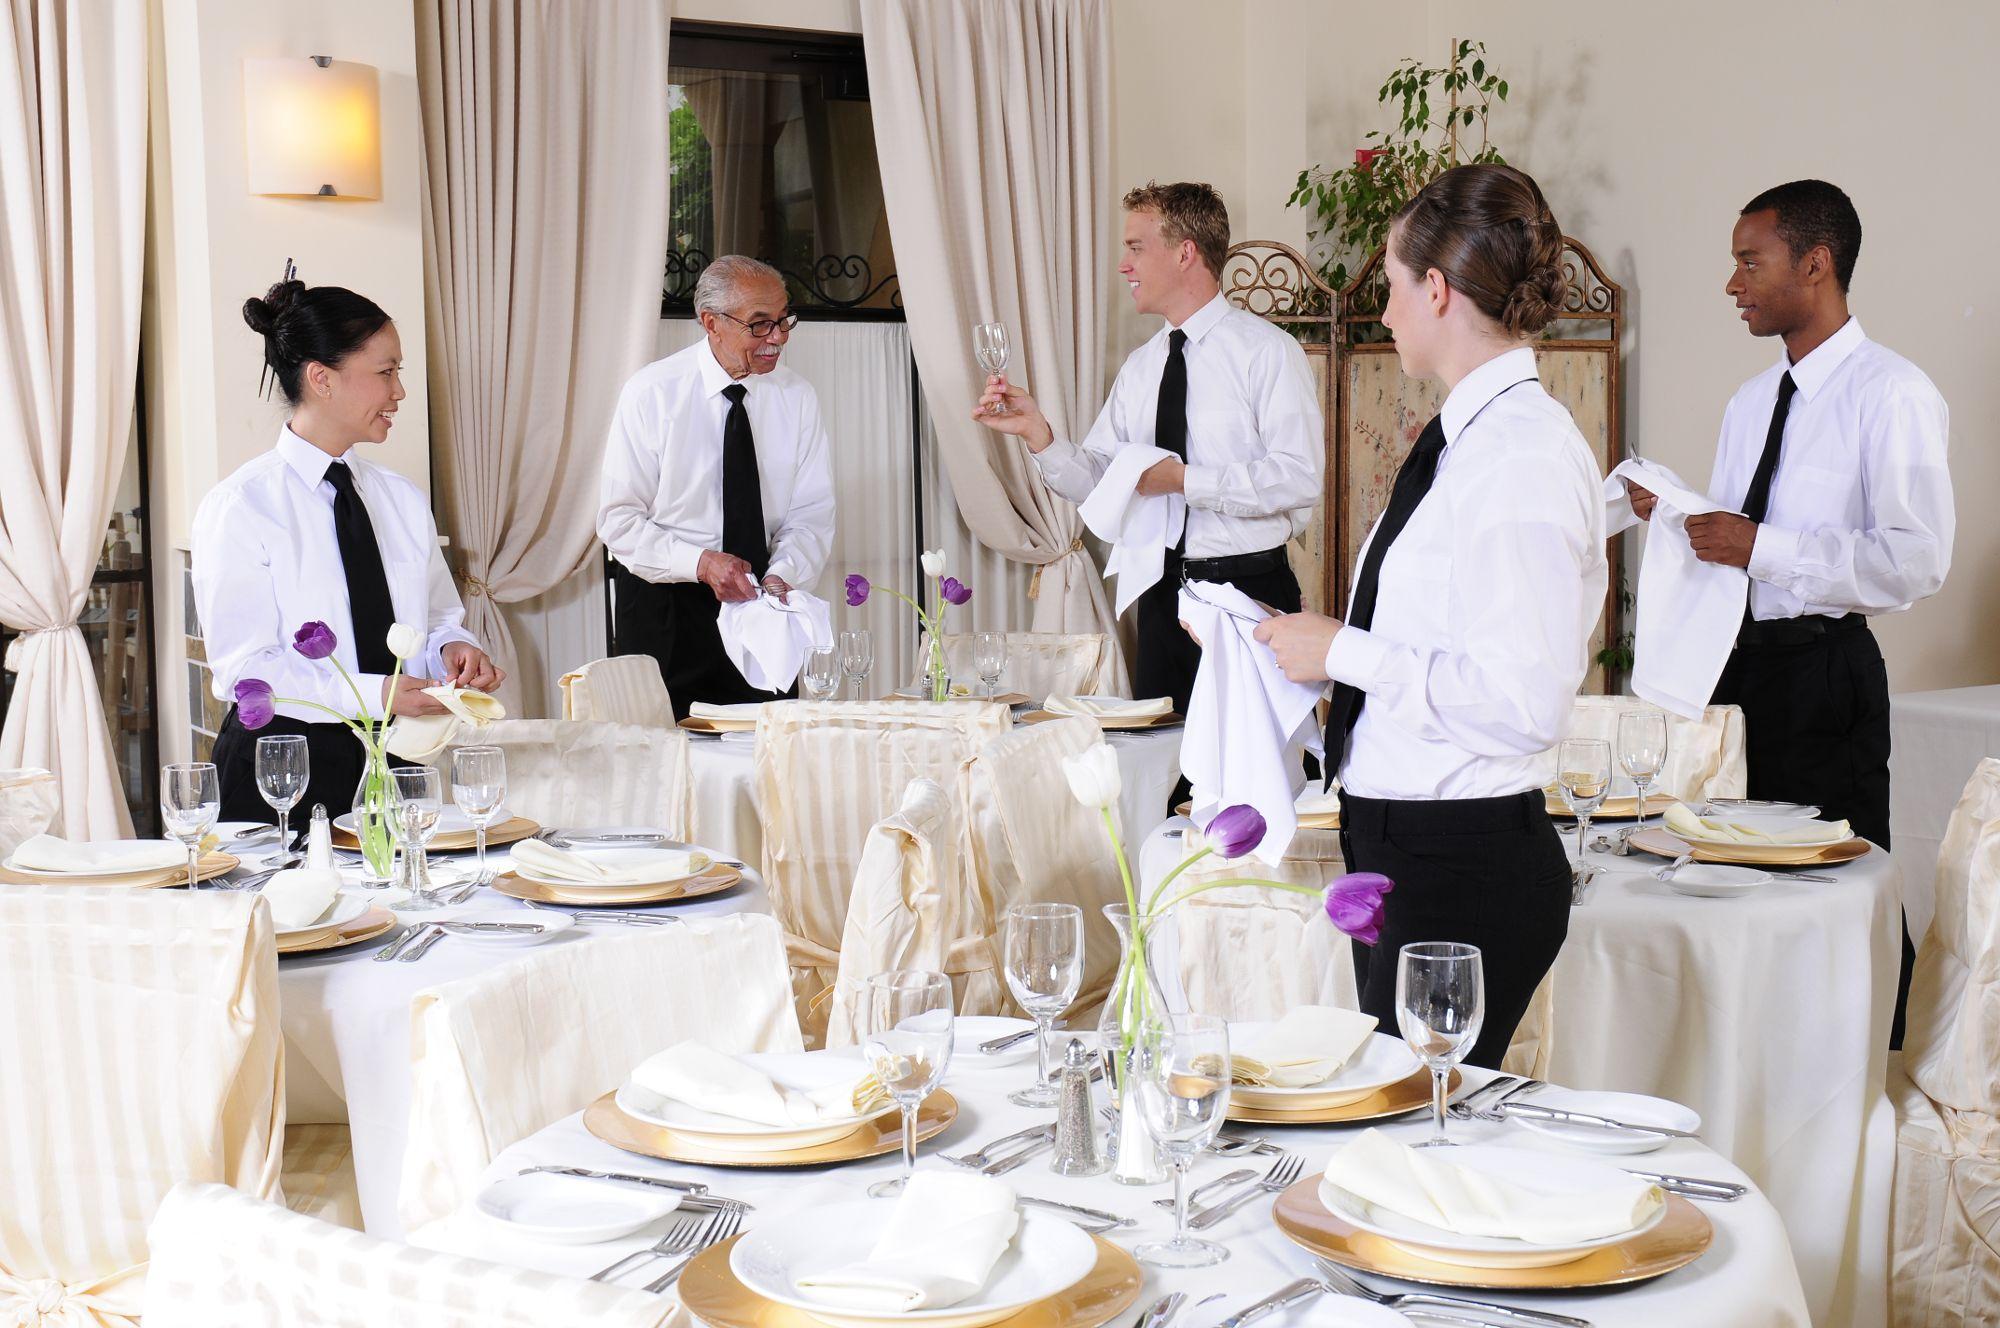 catering server doc tk catering server 23 04 2017